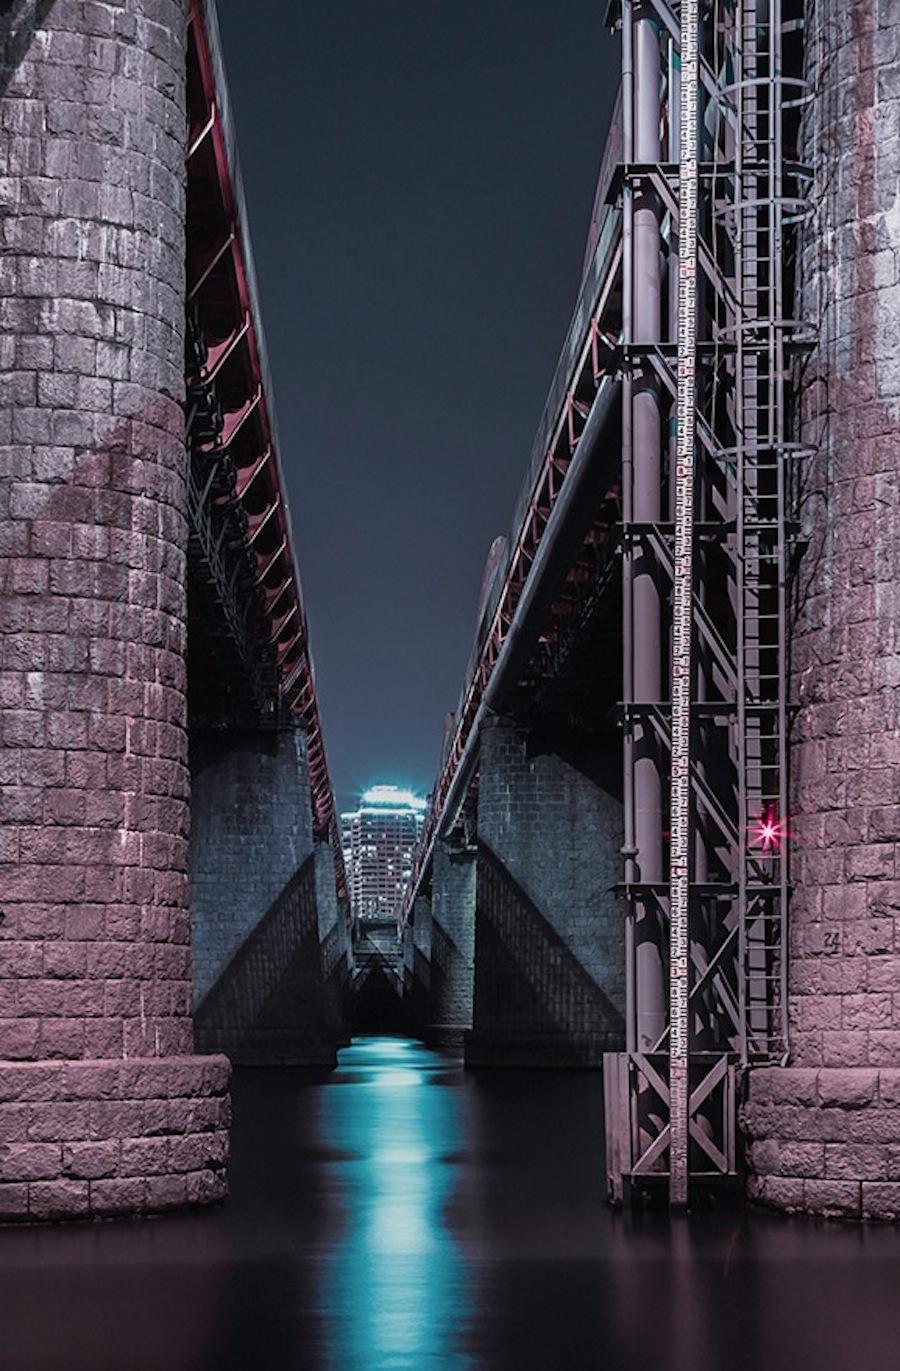 fotografia-notturna-sotto-ponti-seoul-andres-orozco-04